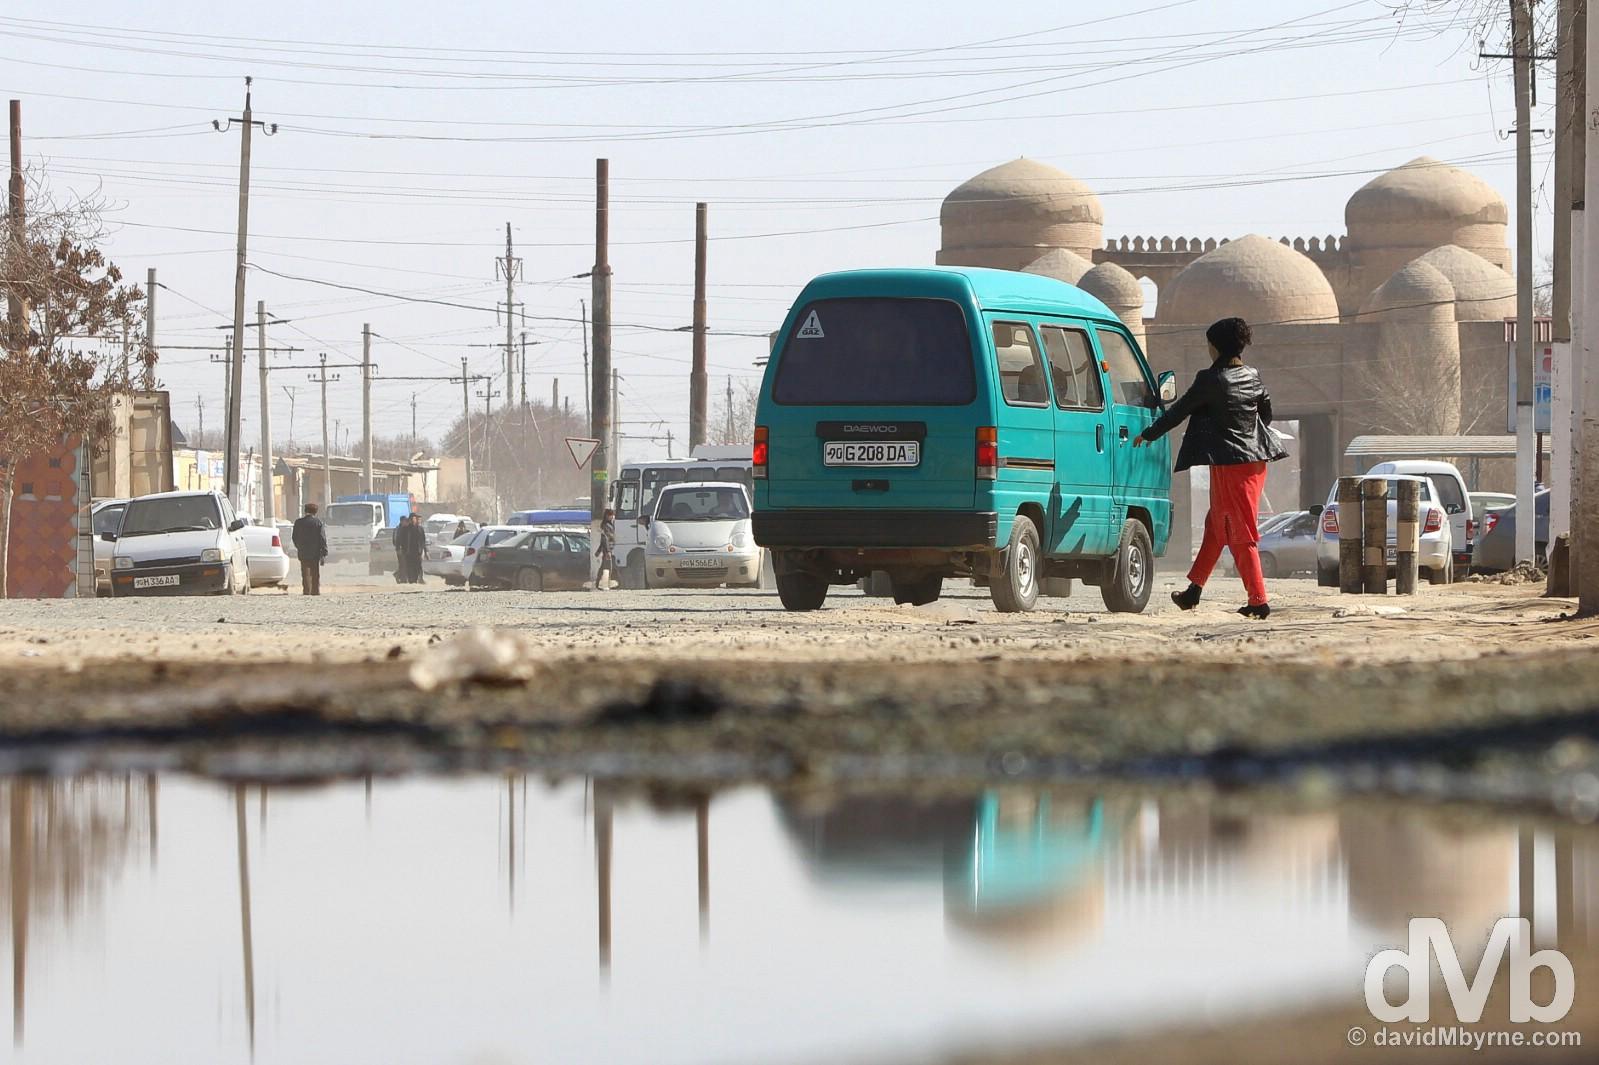 Khiva, Uzbekistan. March 14, 2015.